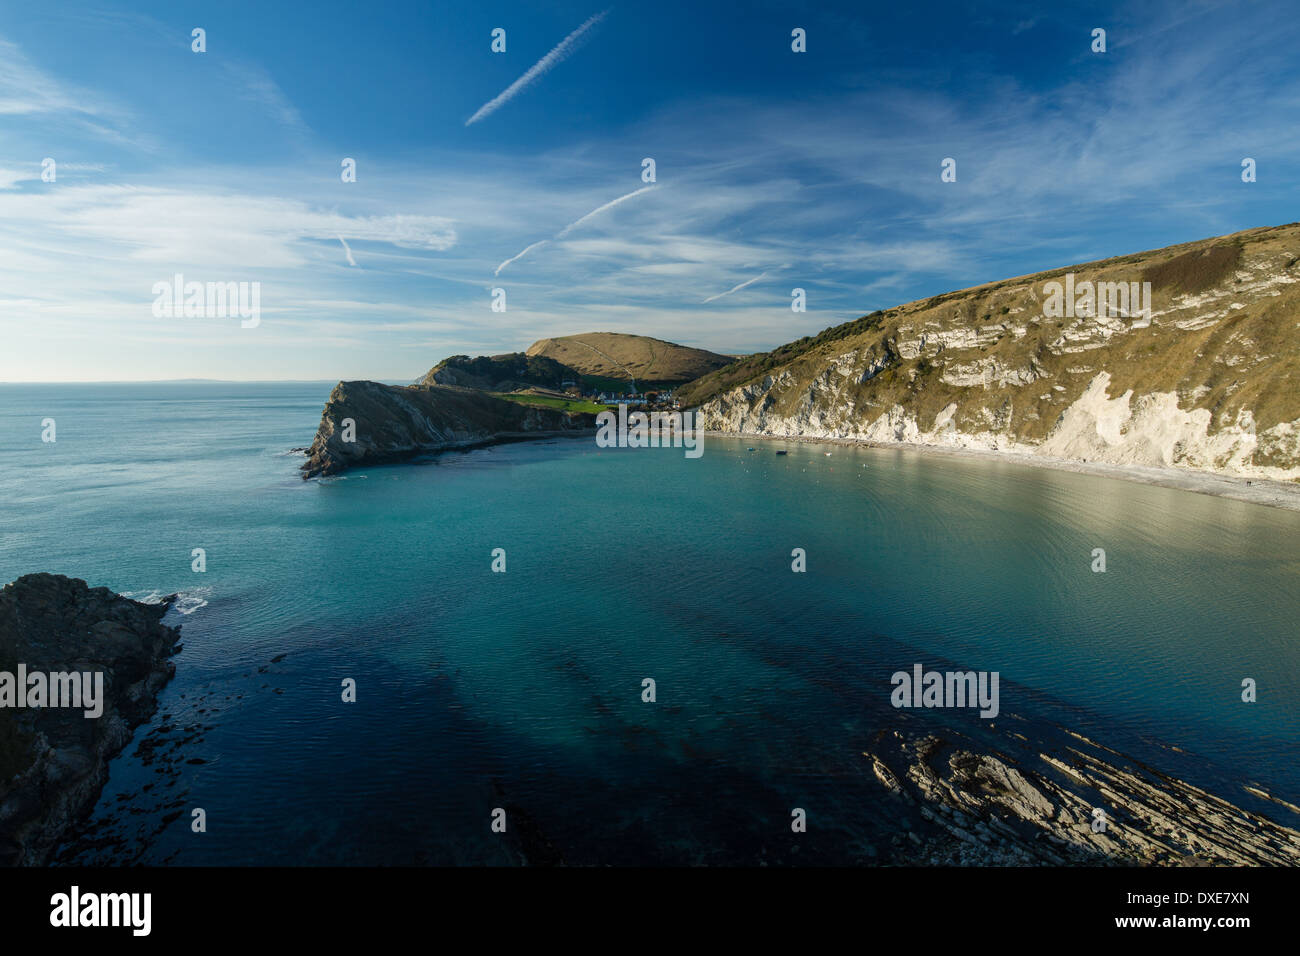 Lulworth Cove, Jurassic Coast, Dorset, England Stockbild